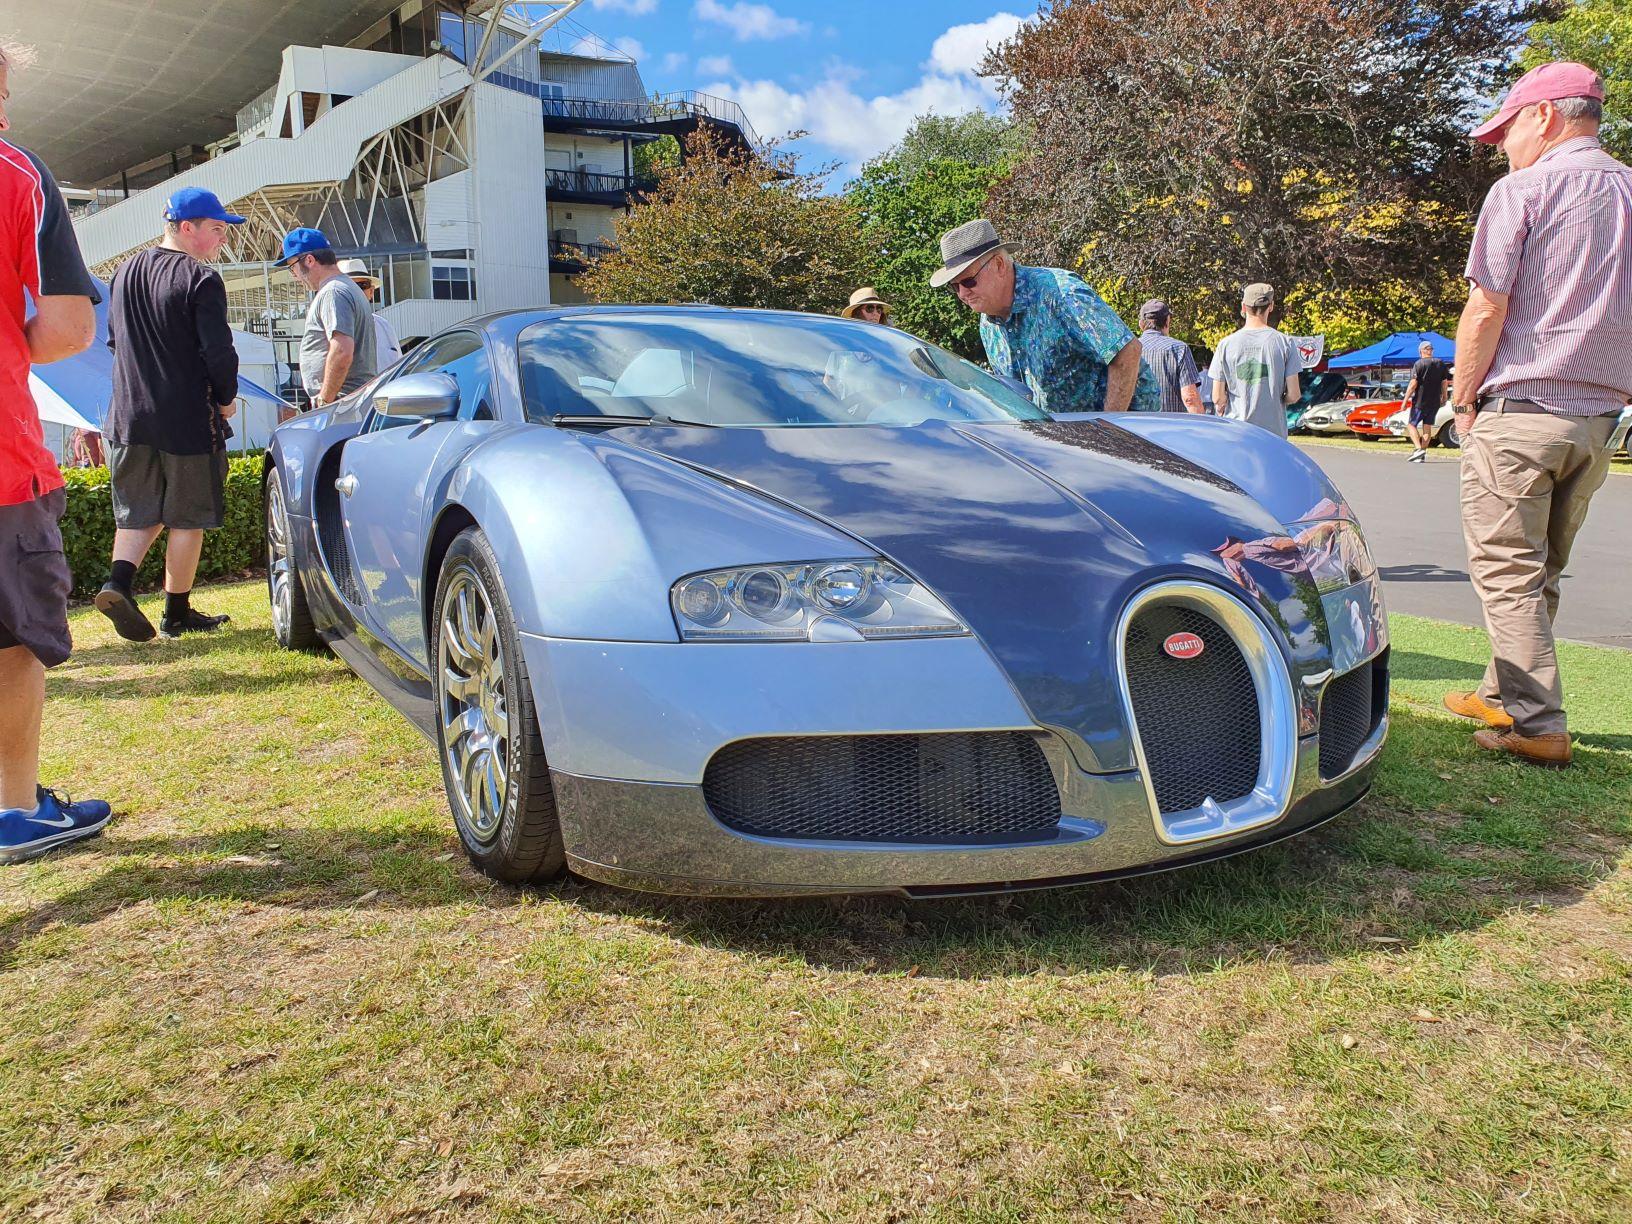 Bugatti Veyron in silver and blue